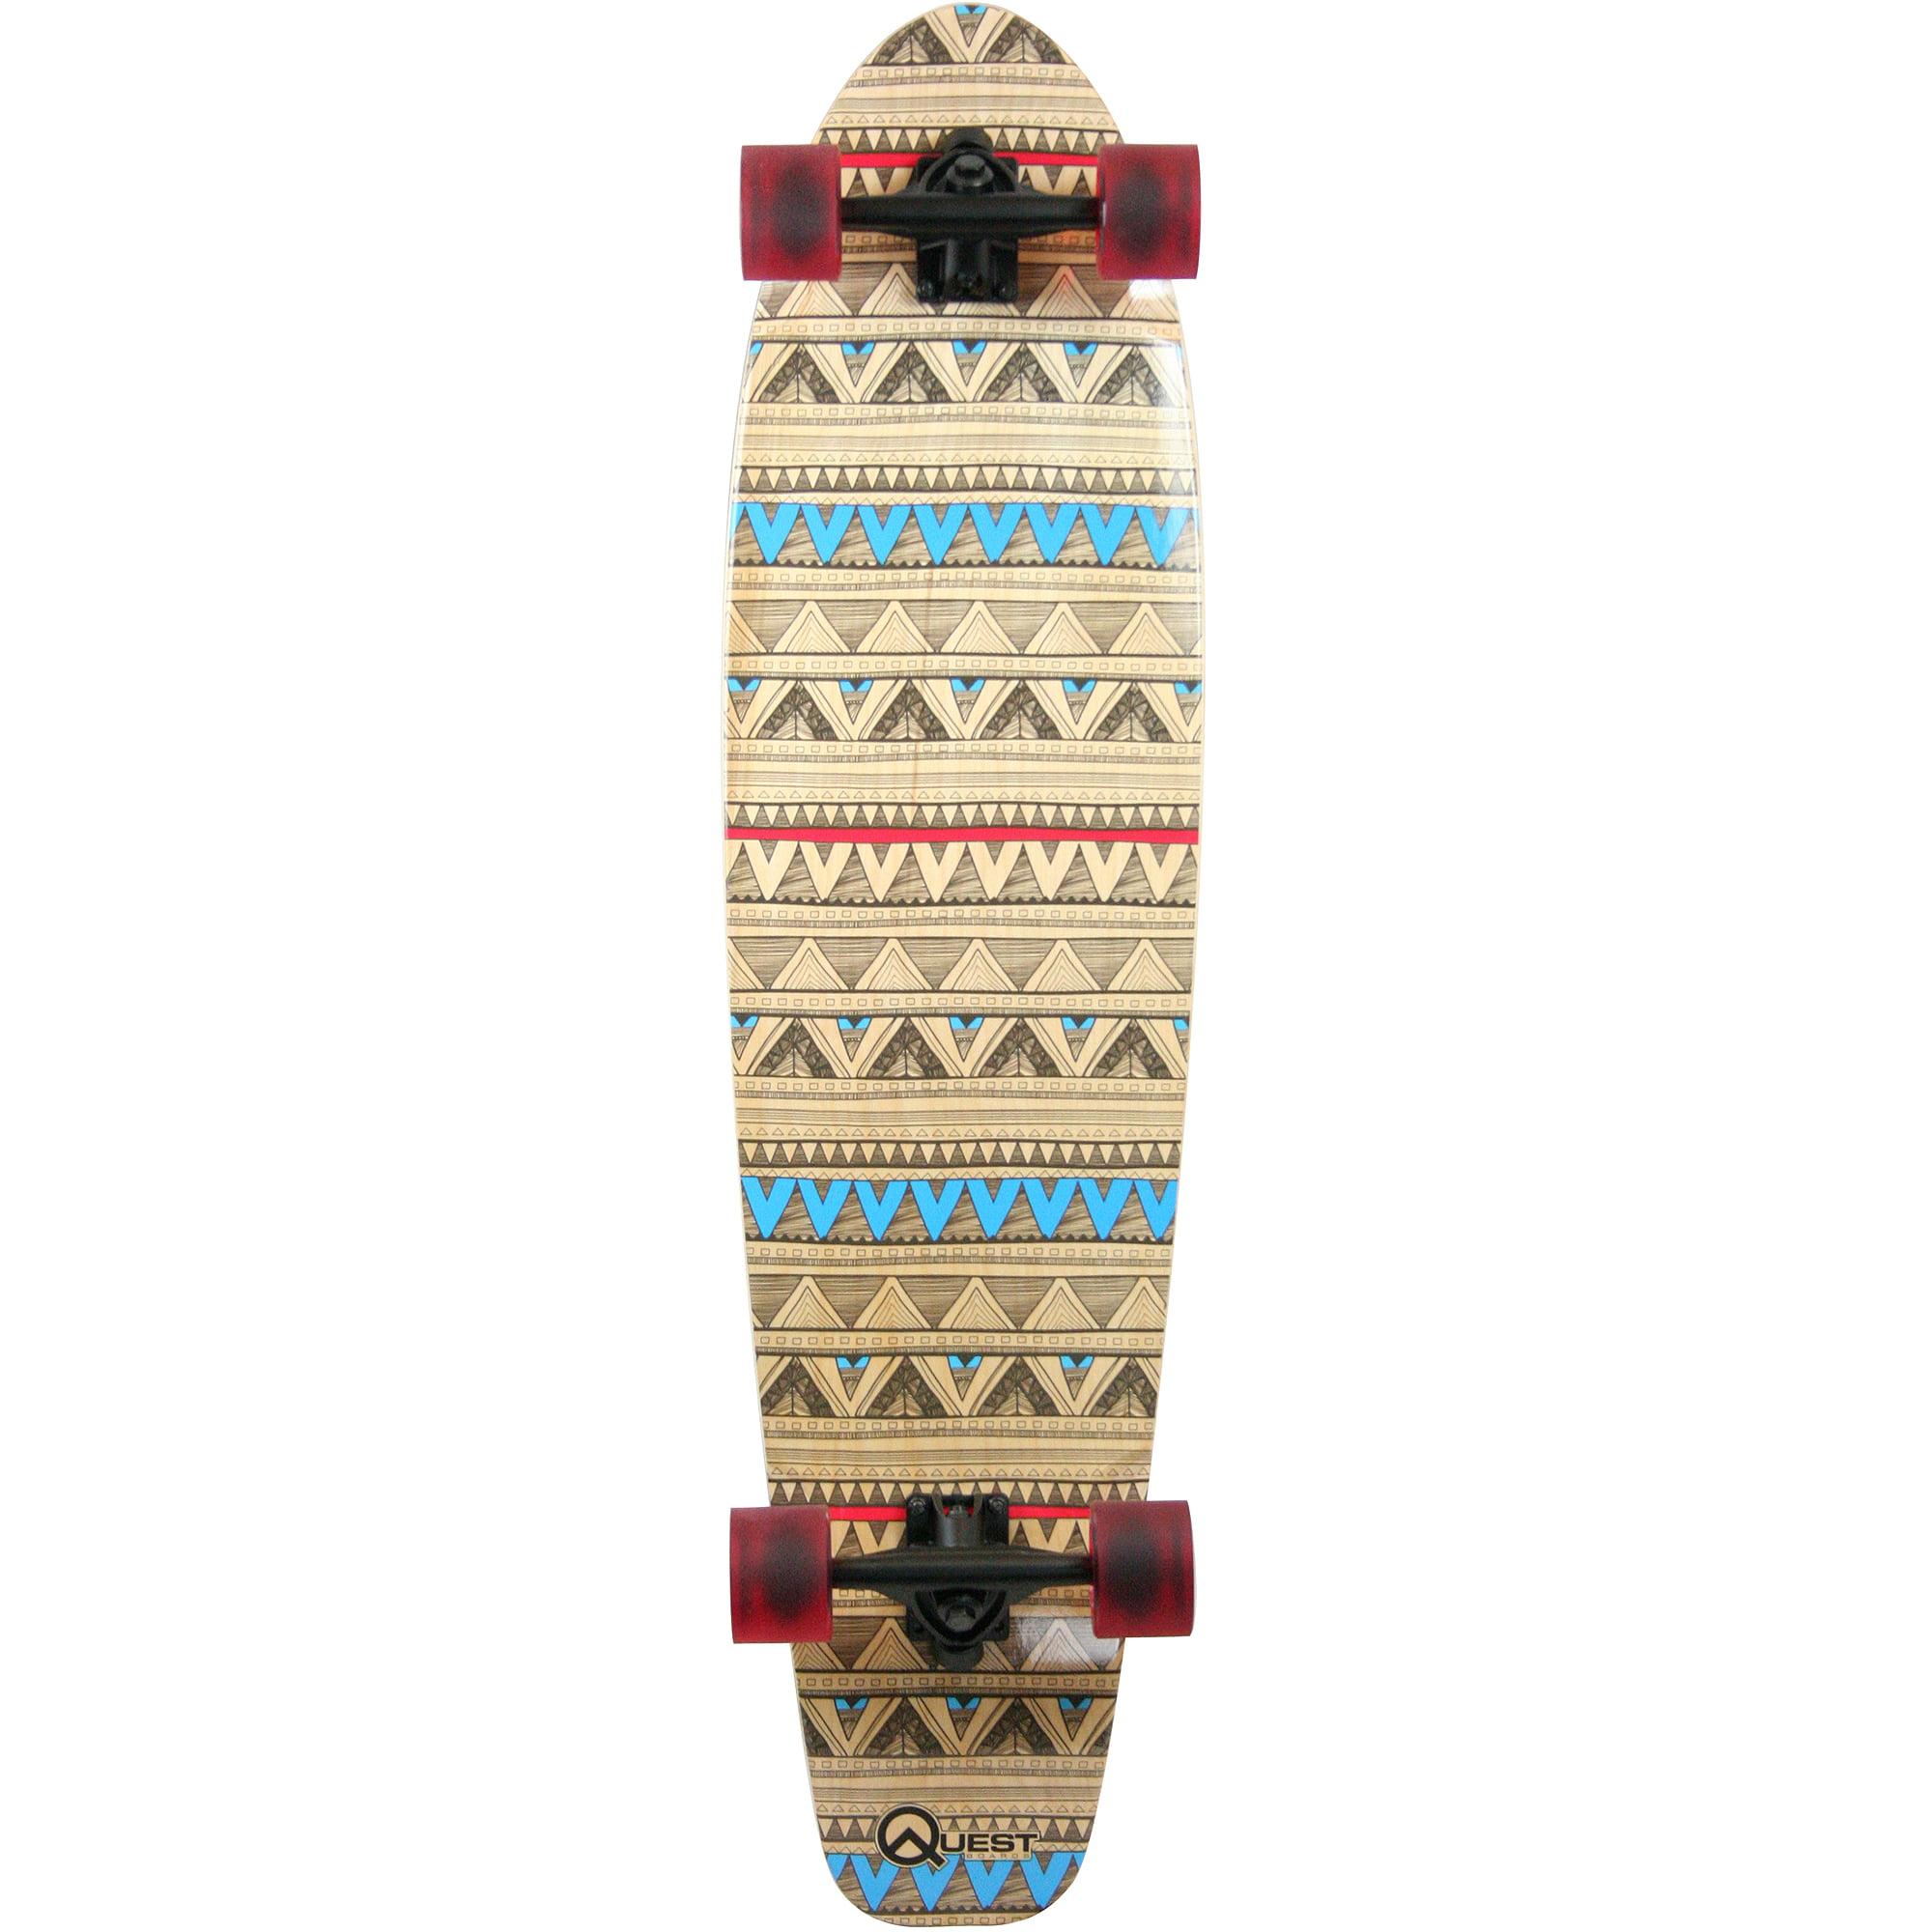 "Quest 40"" Native Spirit Kick Tail Longboard Skateboard by Generic"